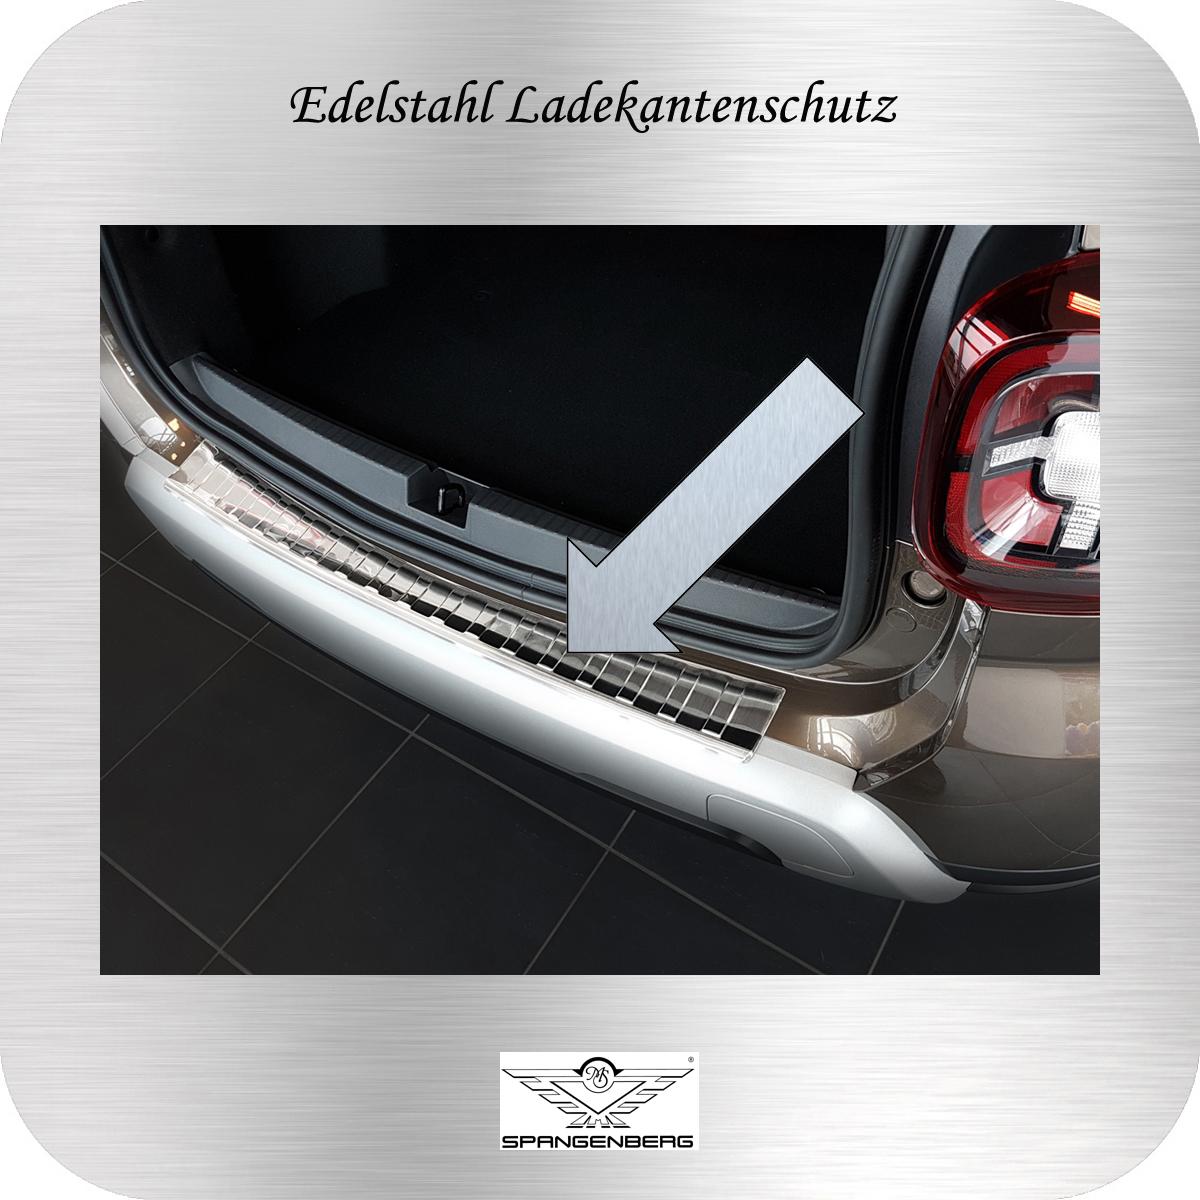 Ladekantenschutz Edelstahl Dacia Duster II SUV 2. Generation ab 01.2018- 3235203